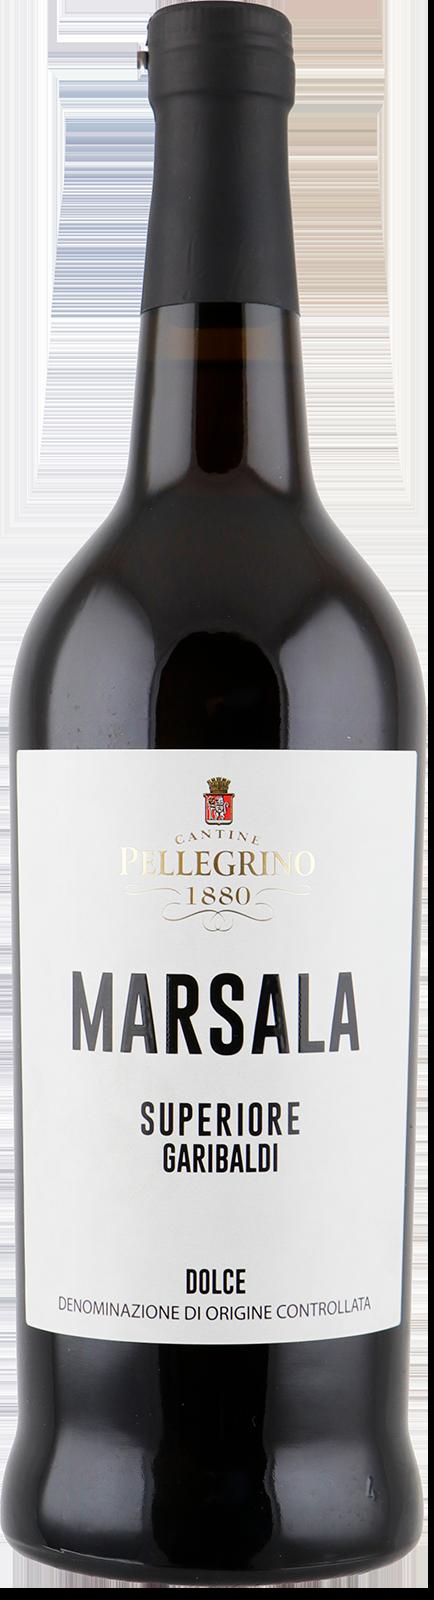 NV-Pellegrino Marsala Superiore